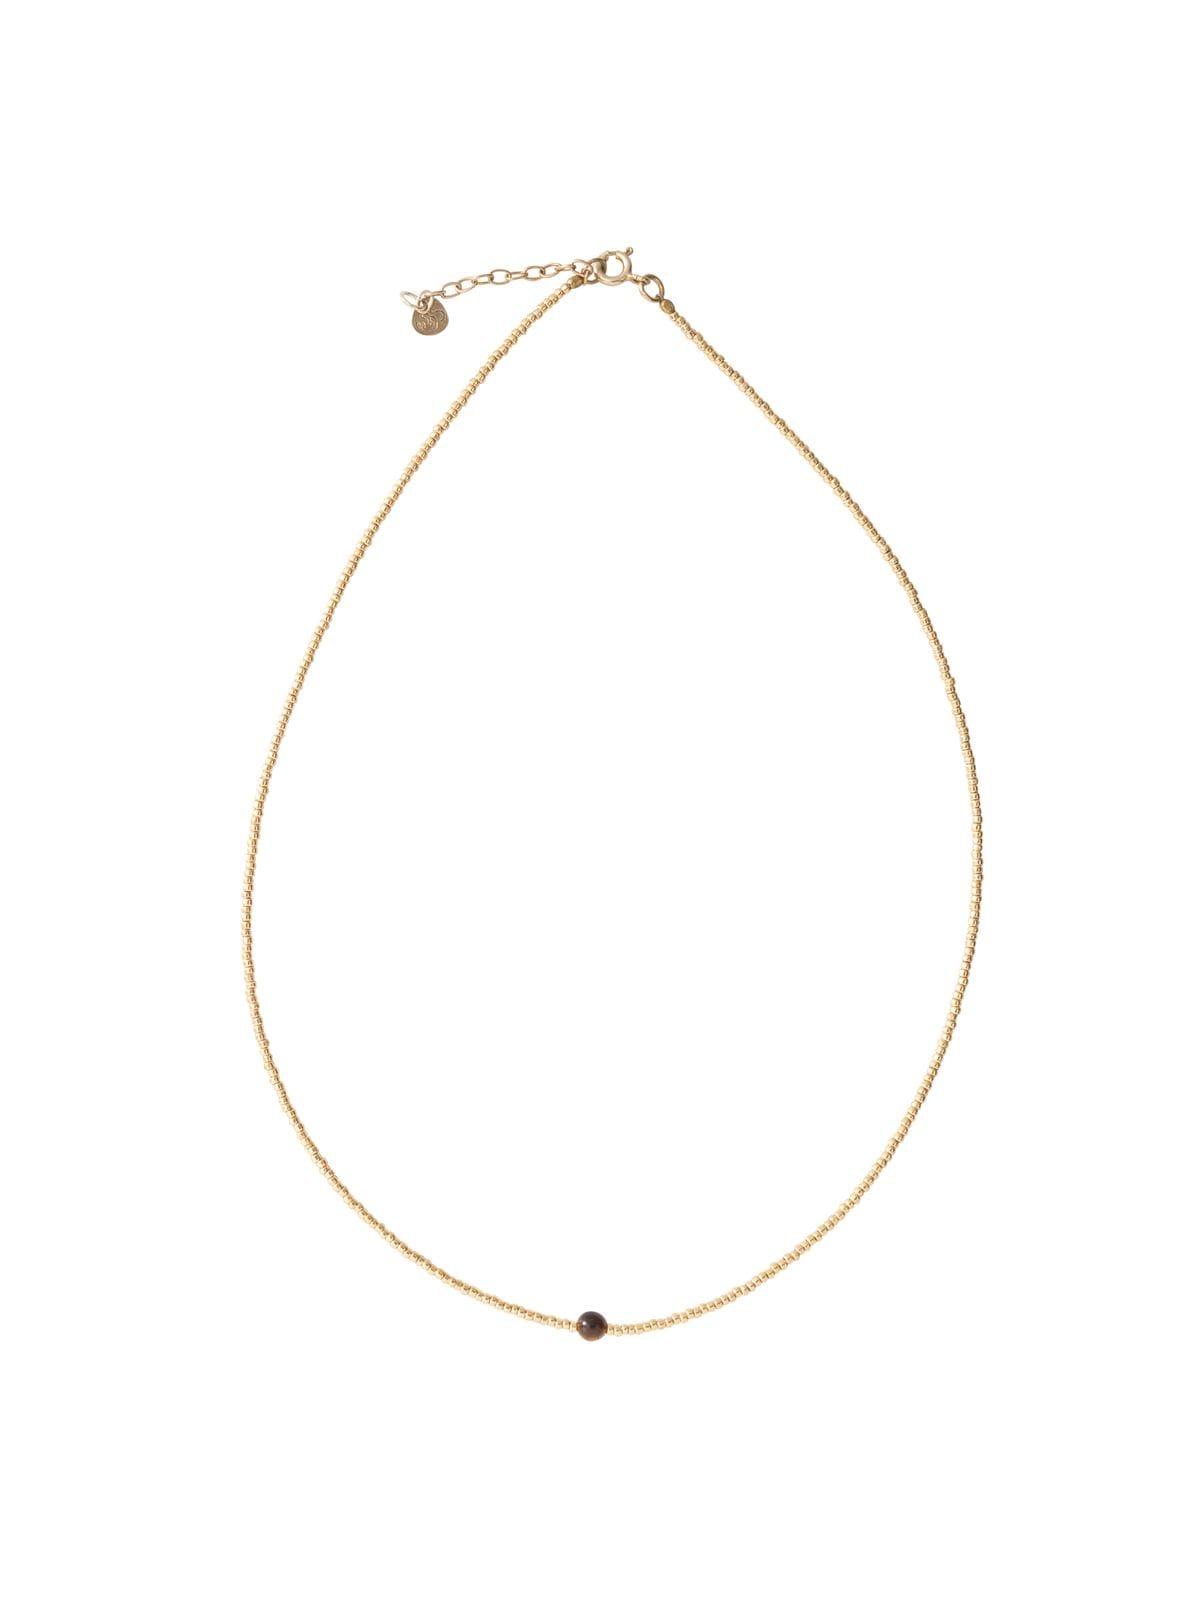 BL24480_2 - Flora Tiger Eye Gold Necklace_1200x1600